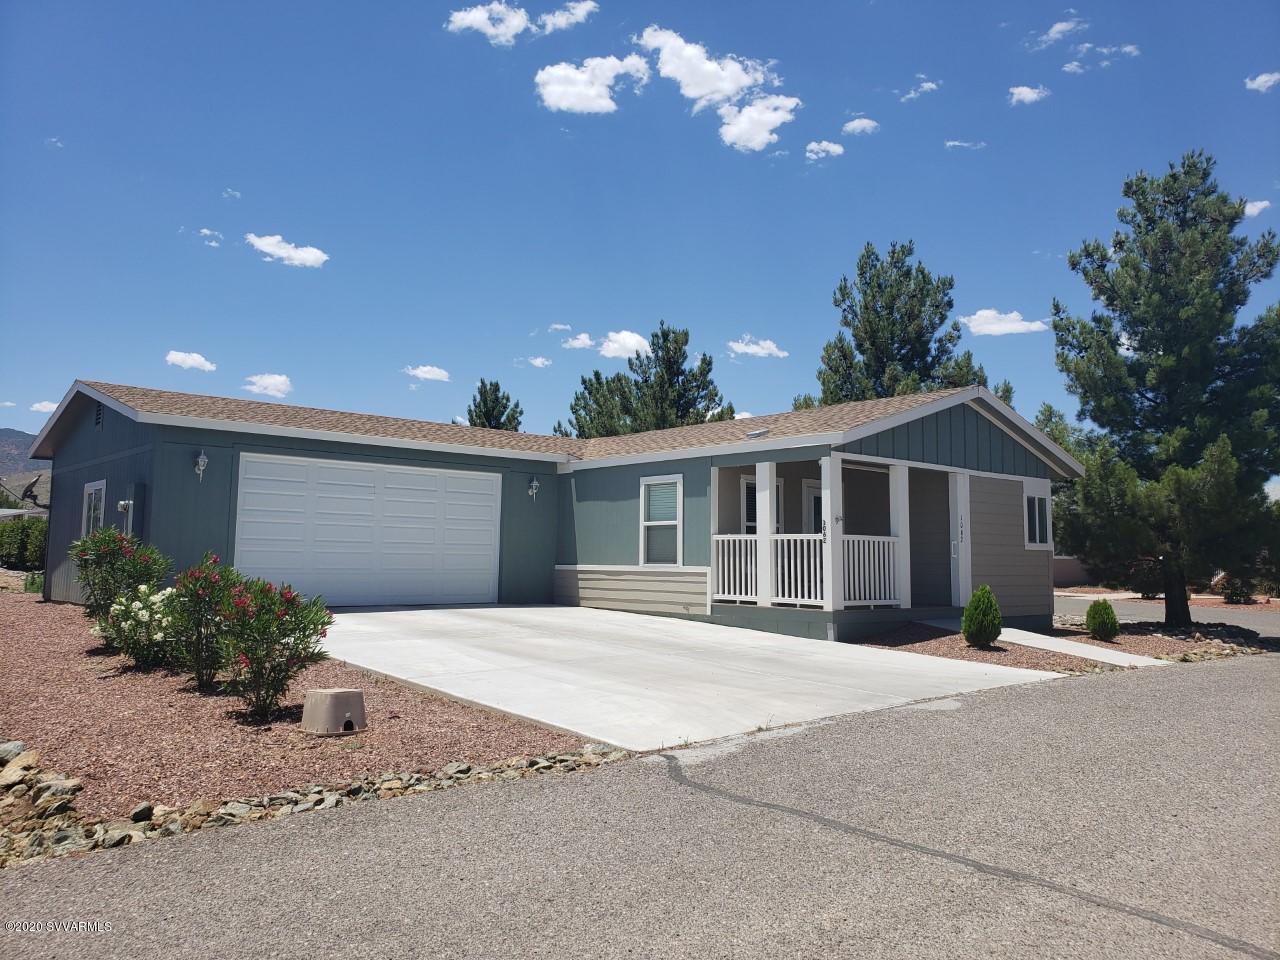 1062 Miller Drive Cottonwood, AZ 86326